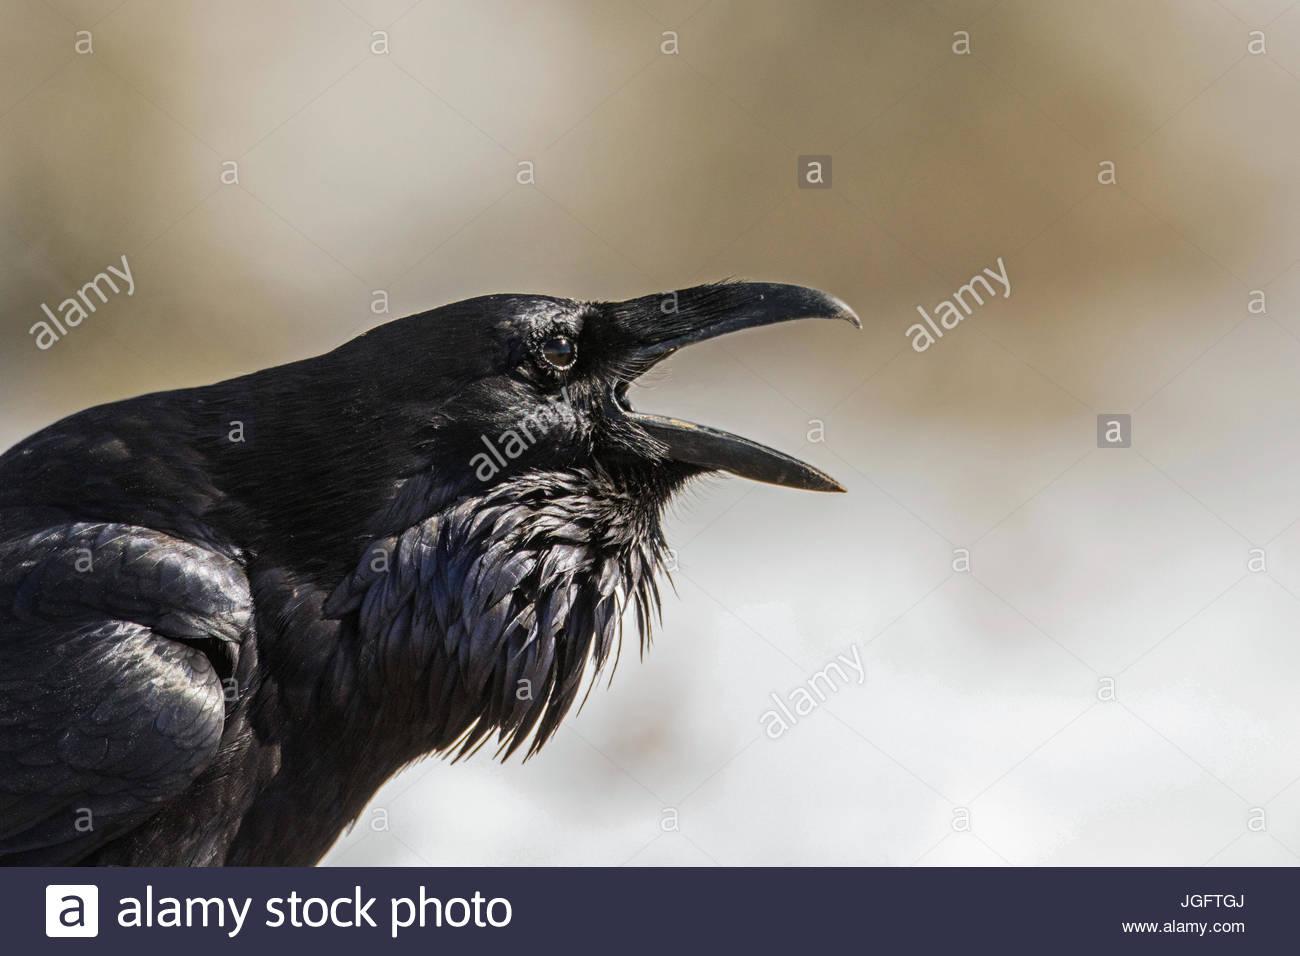 Eine gemeinsame Rabe, Corvus Corax, vocalizing in Wyoming Yellowstone National Park. Stockbild